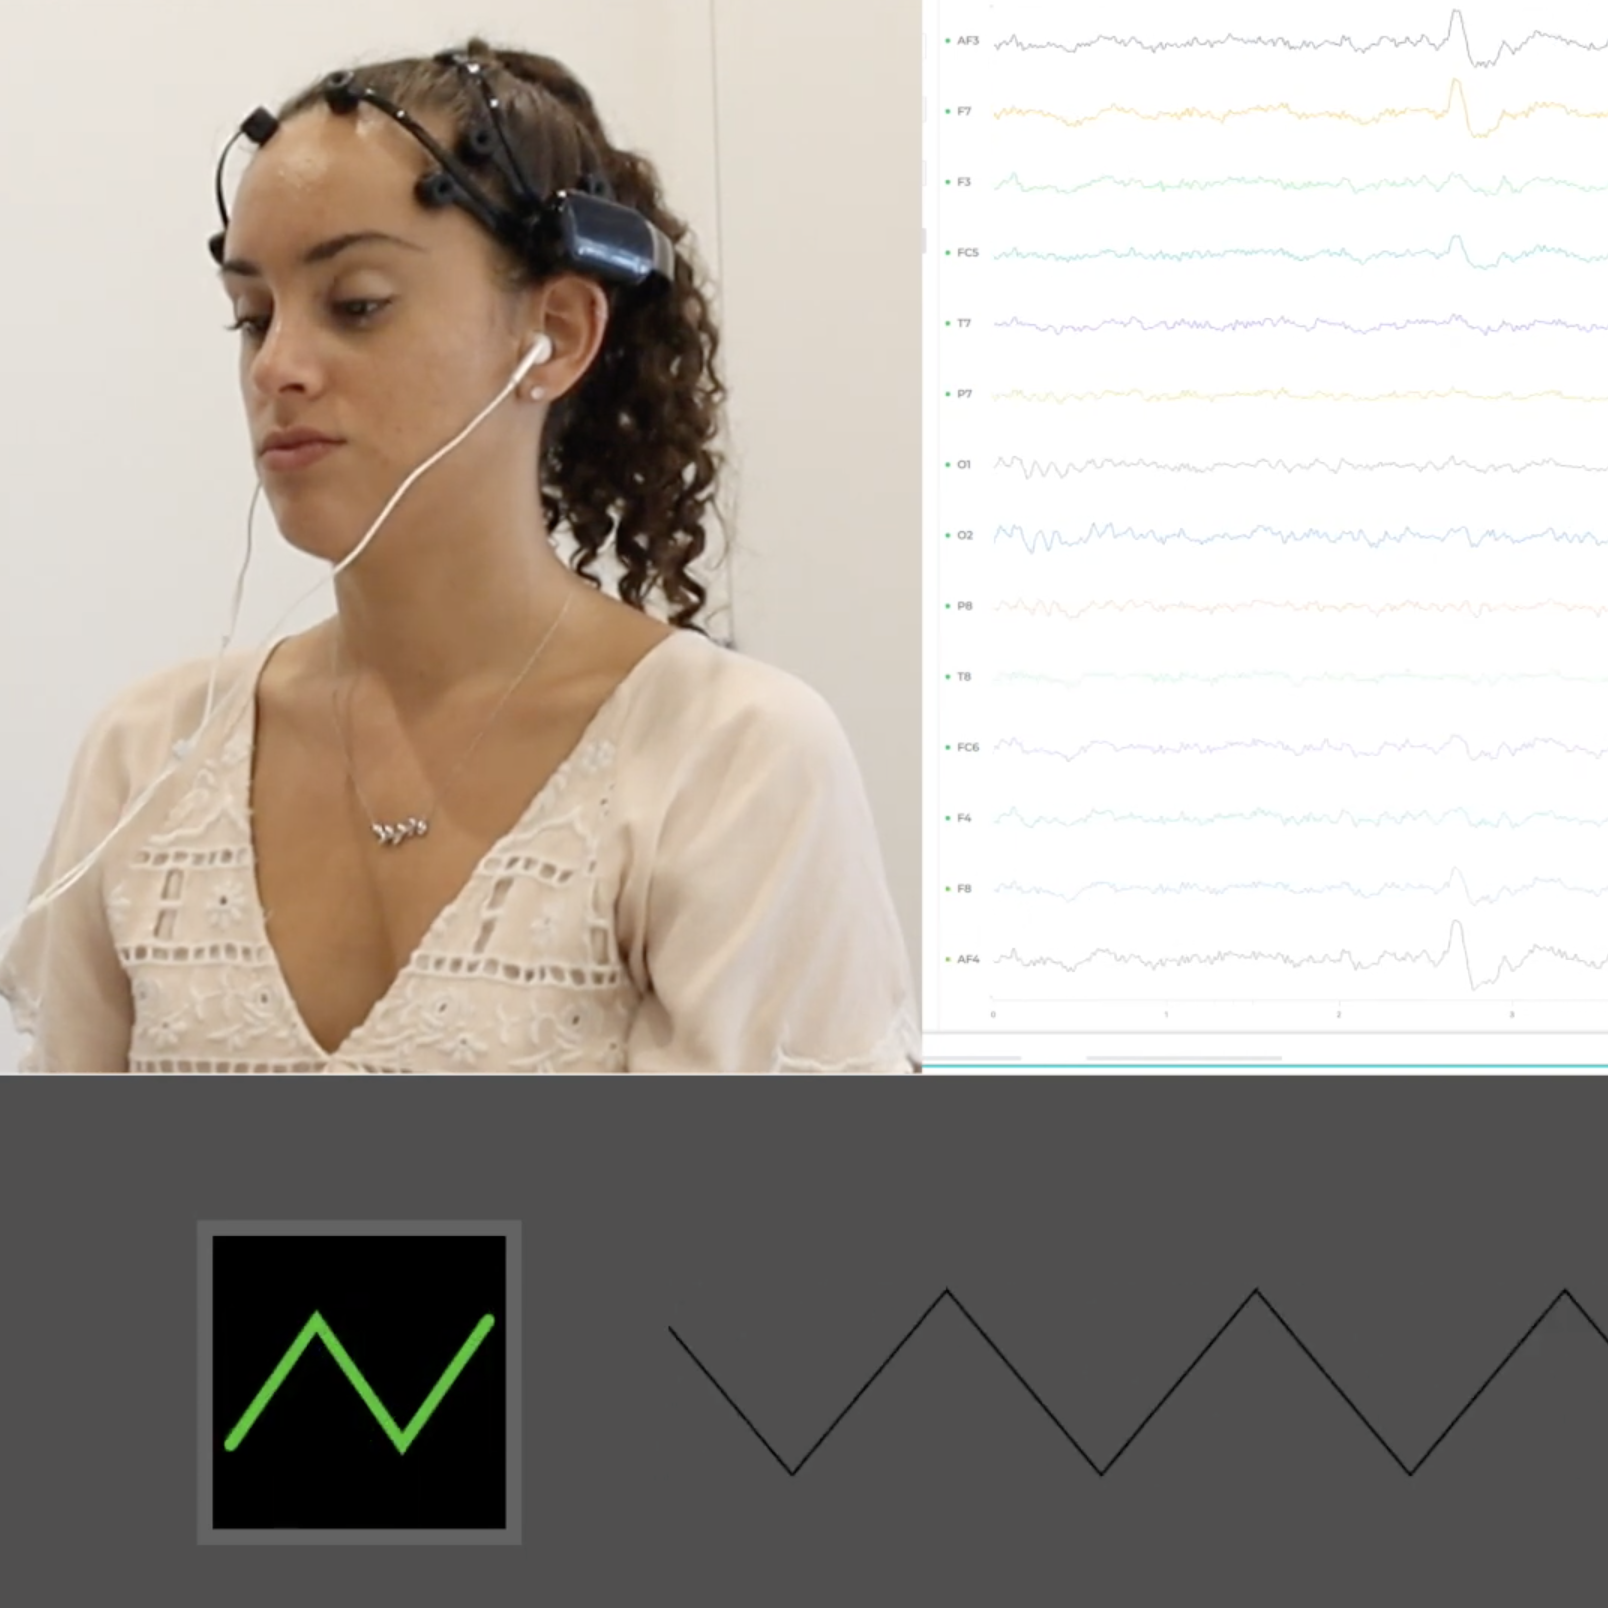 Girl wearing EMOTIV brain-computer interface with live-streamed EEG data